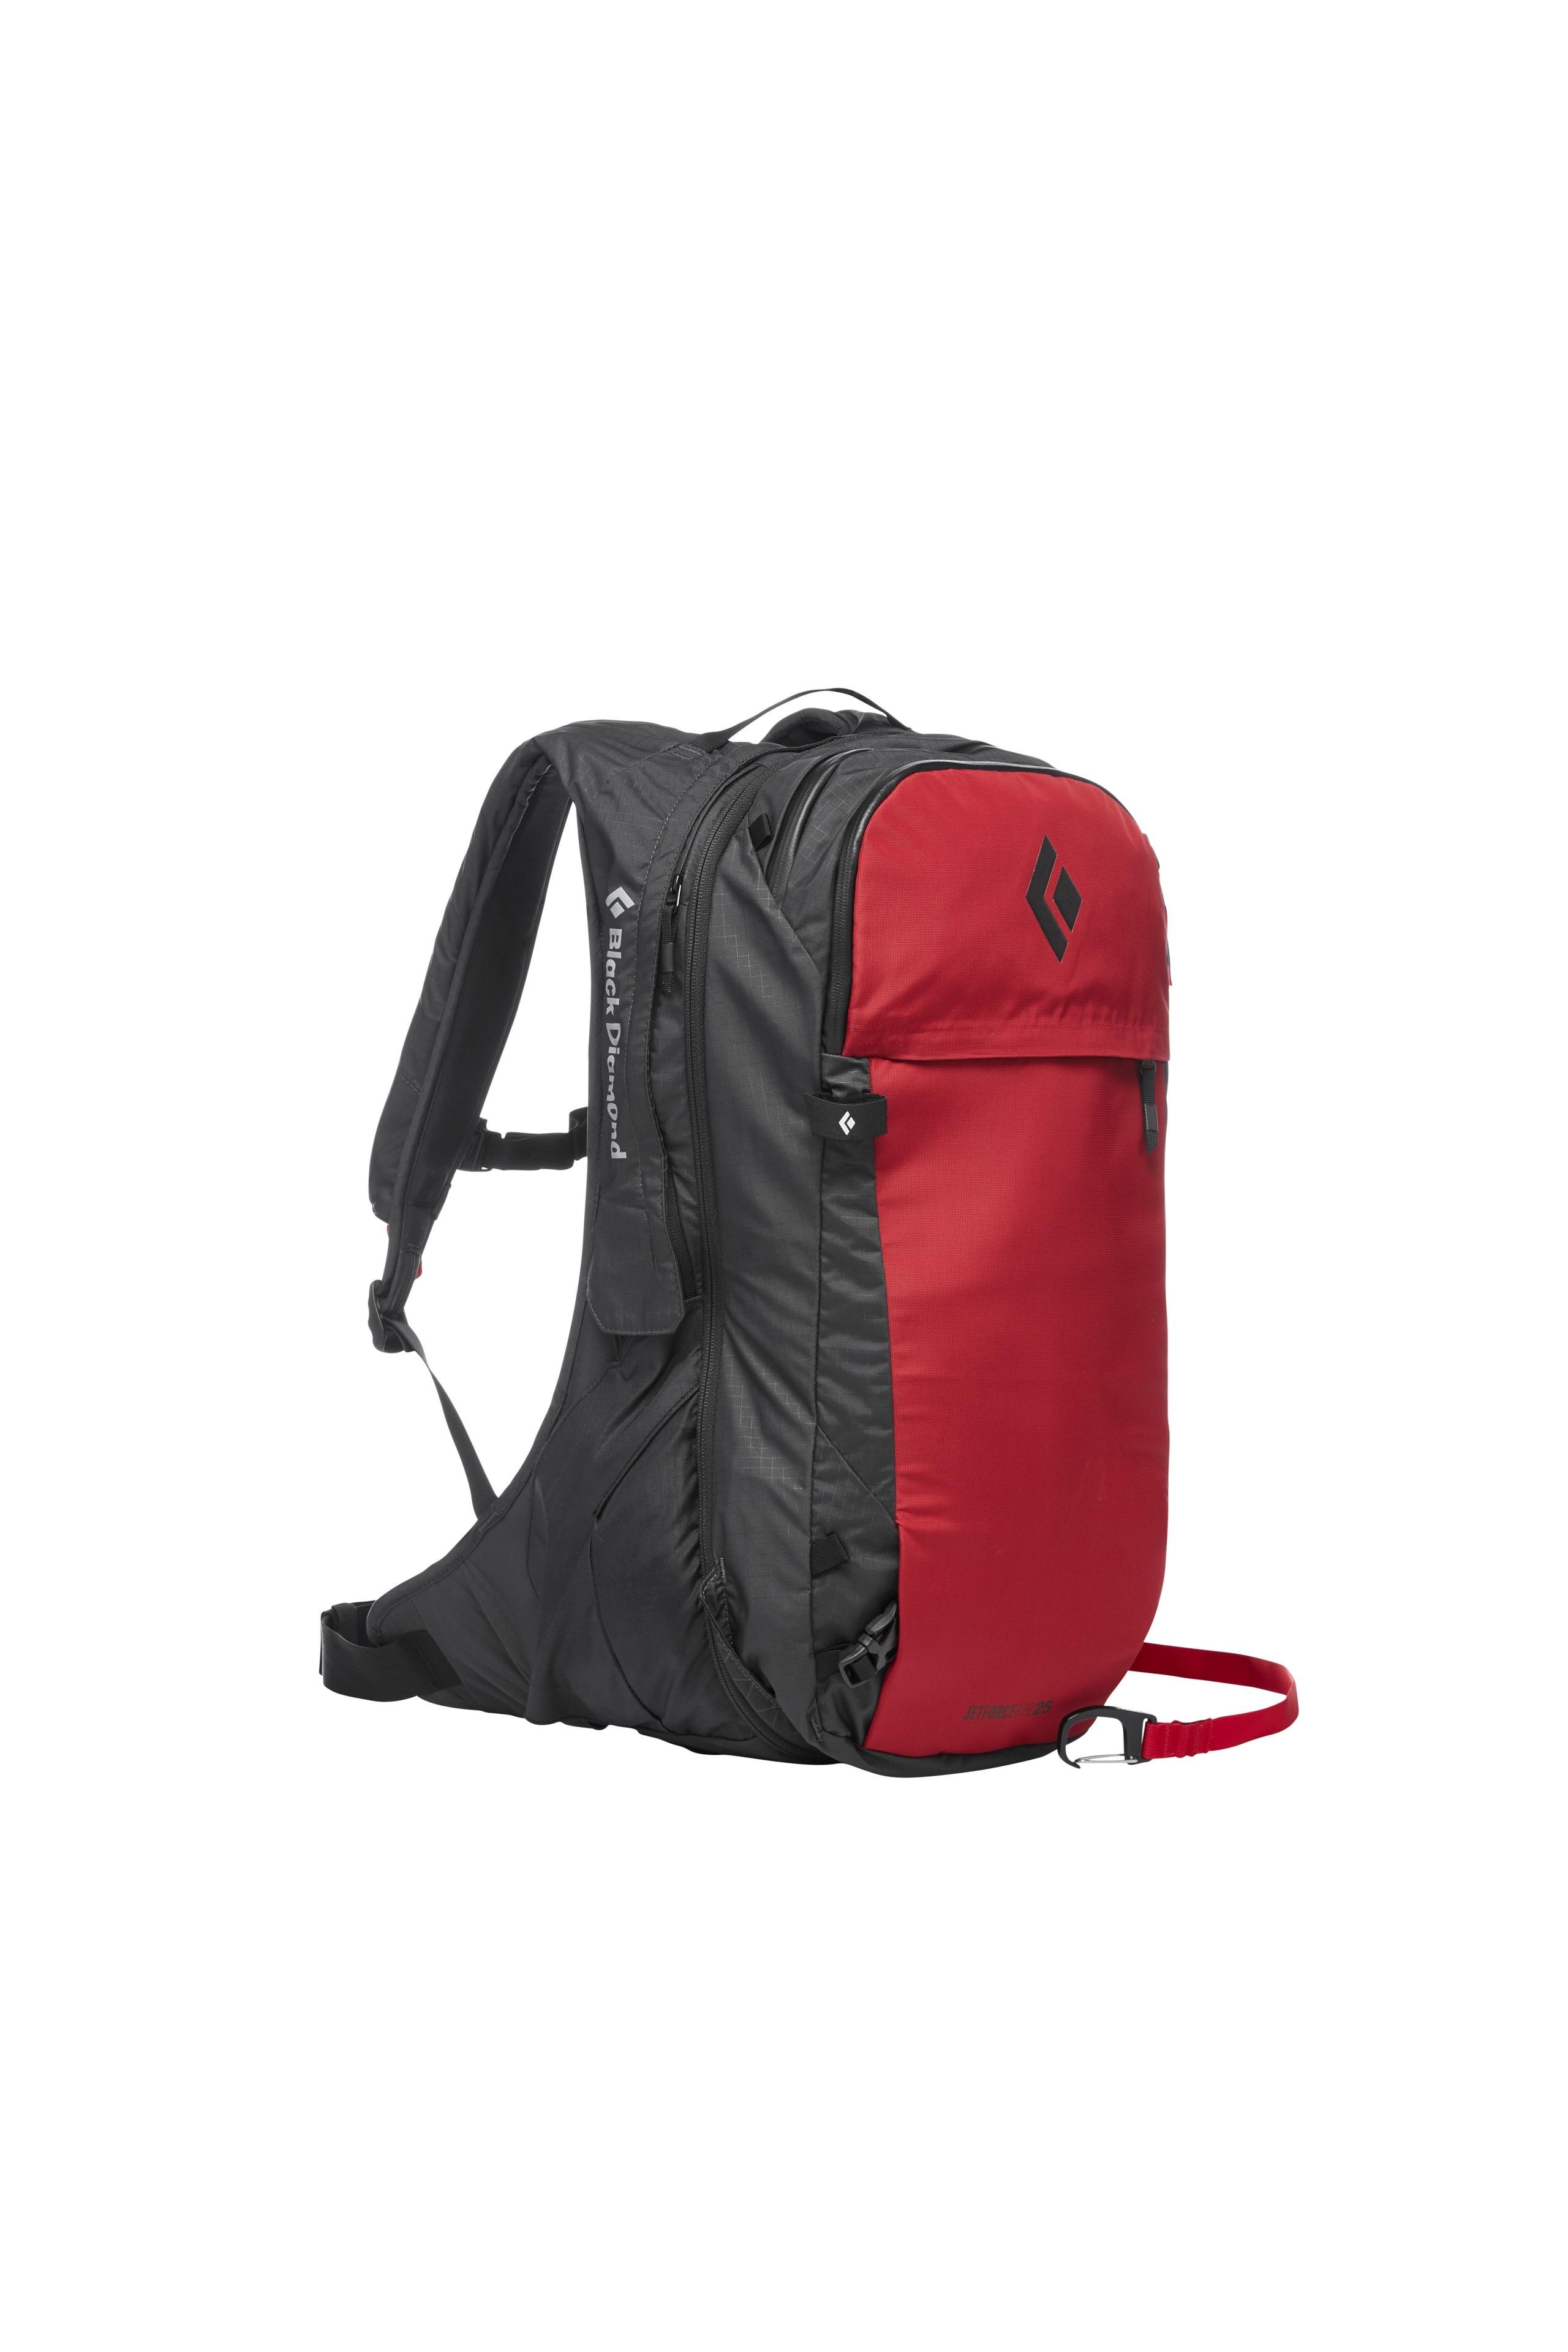 Black Diamond Jetforce Pro Pack 25L Red